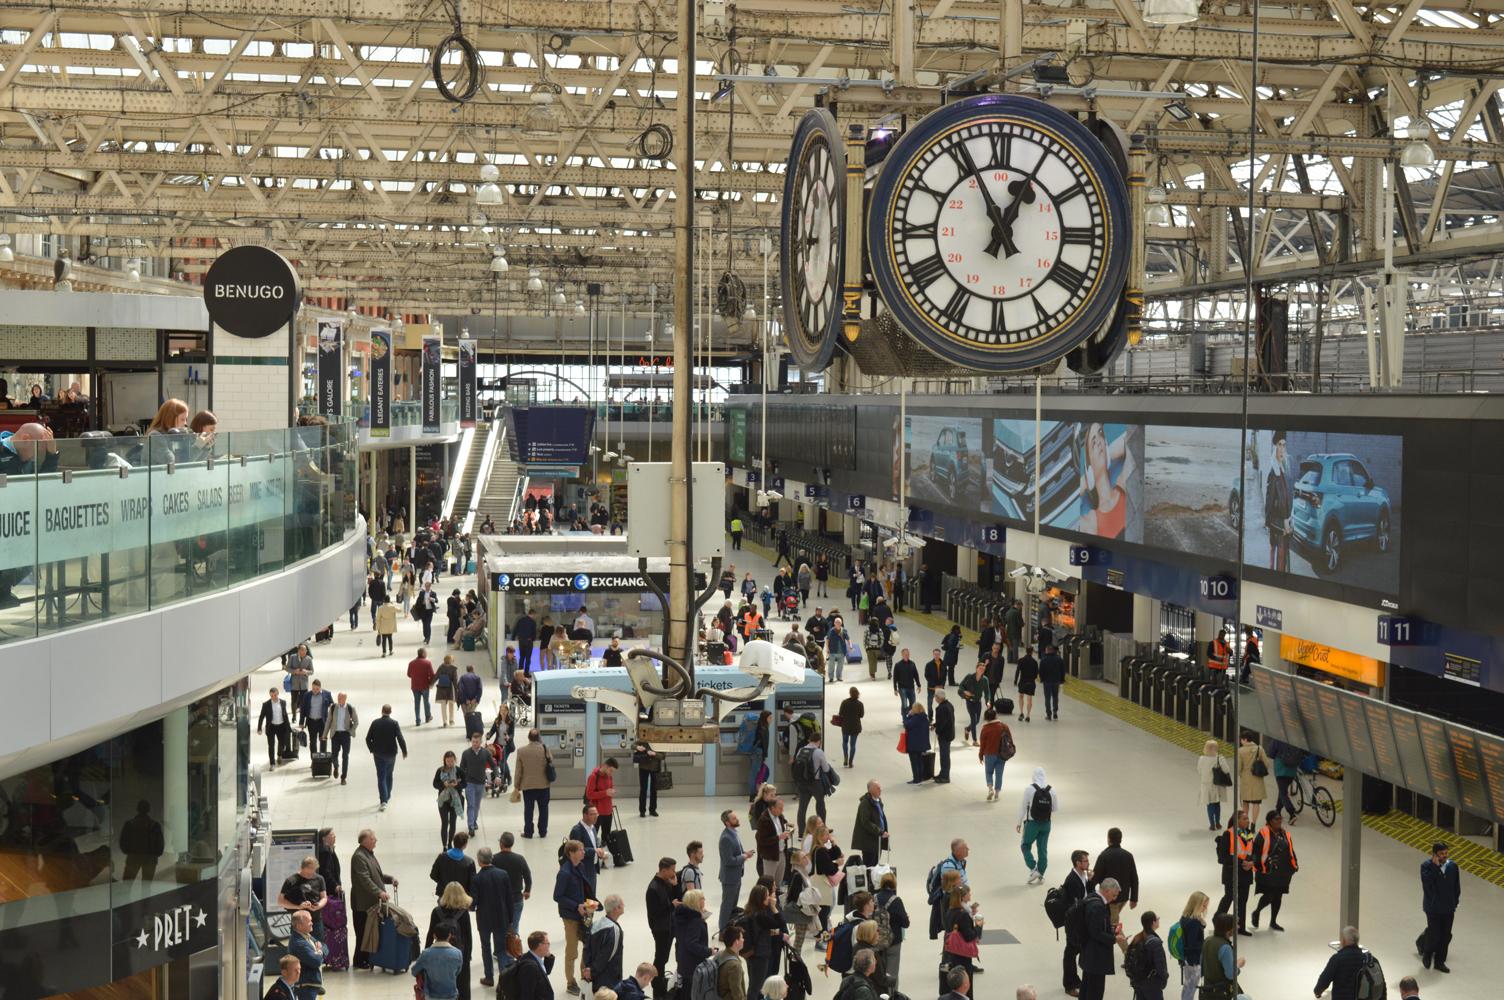 035 Victoria Station. 26.04.2019